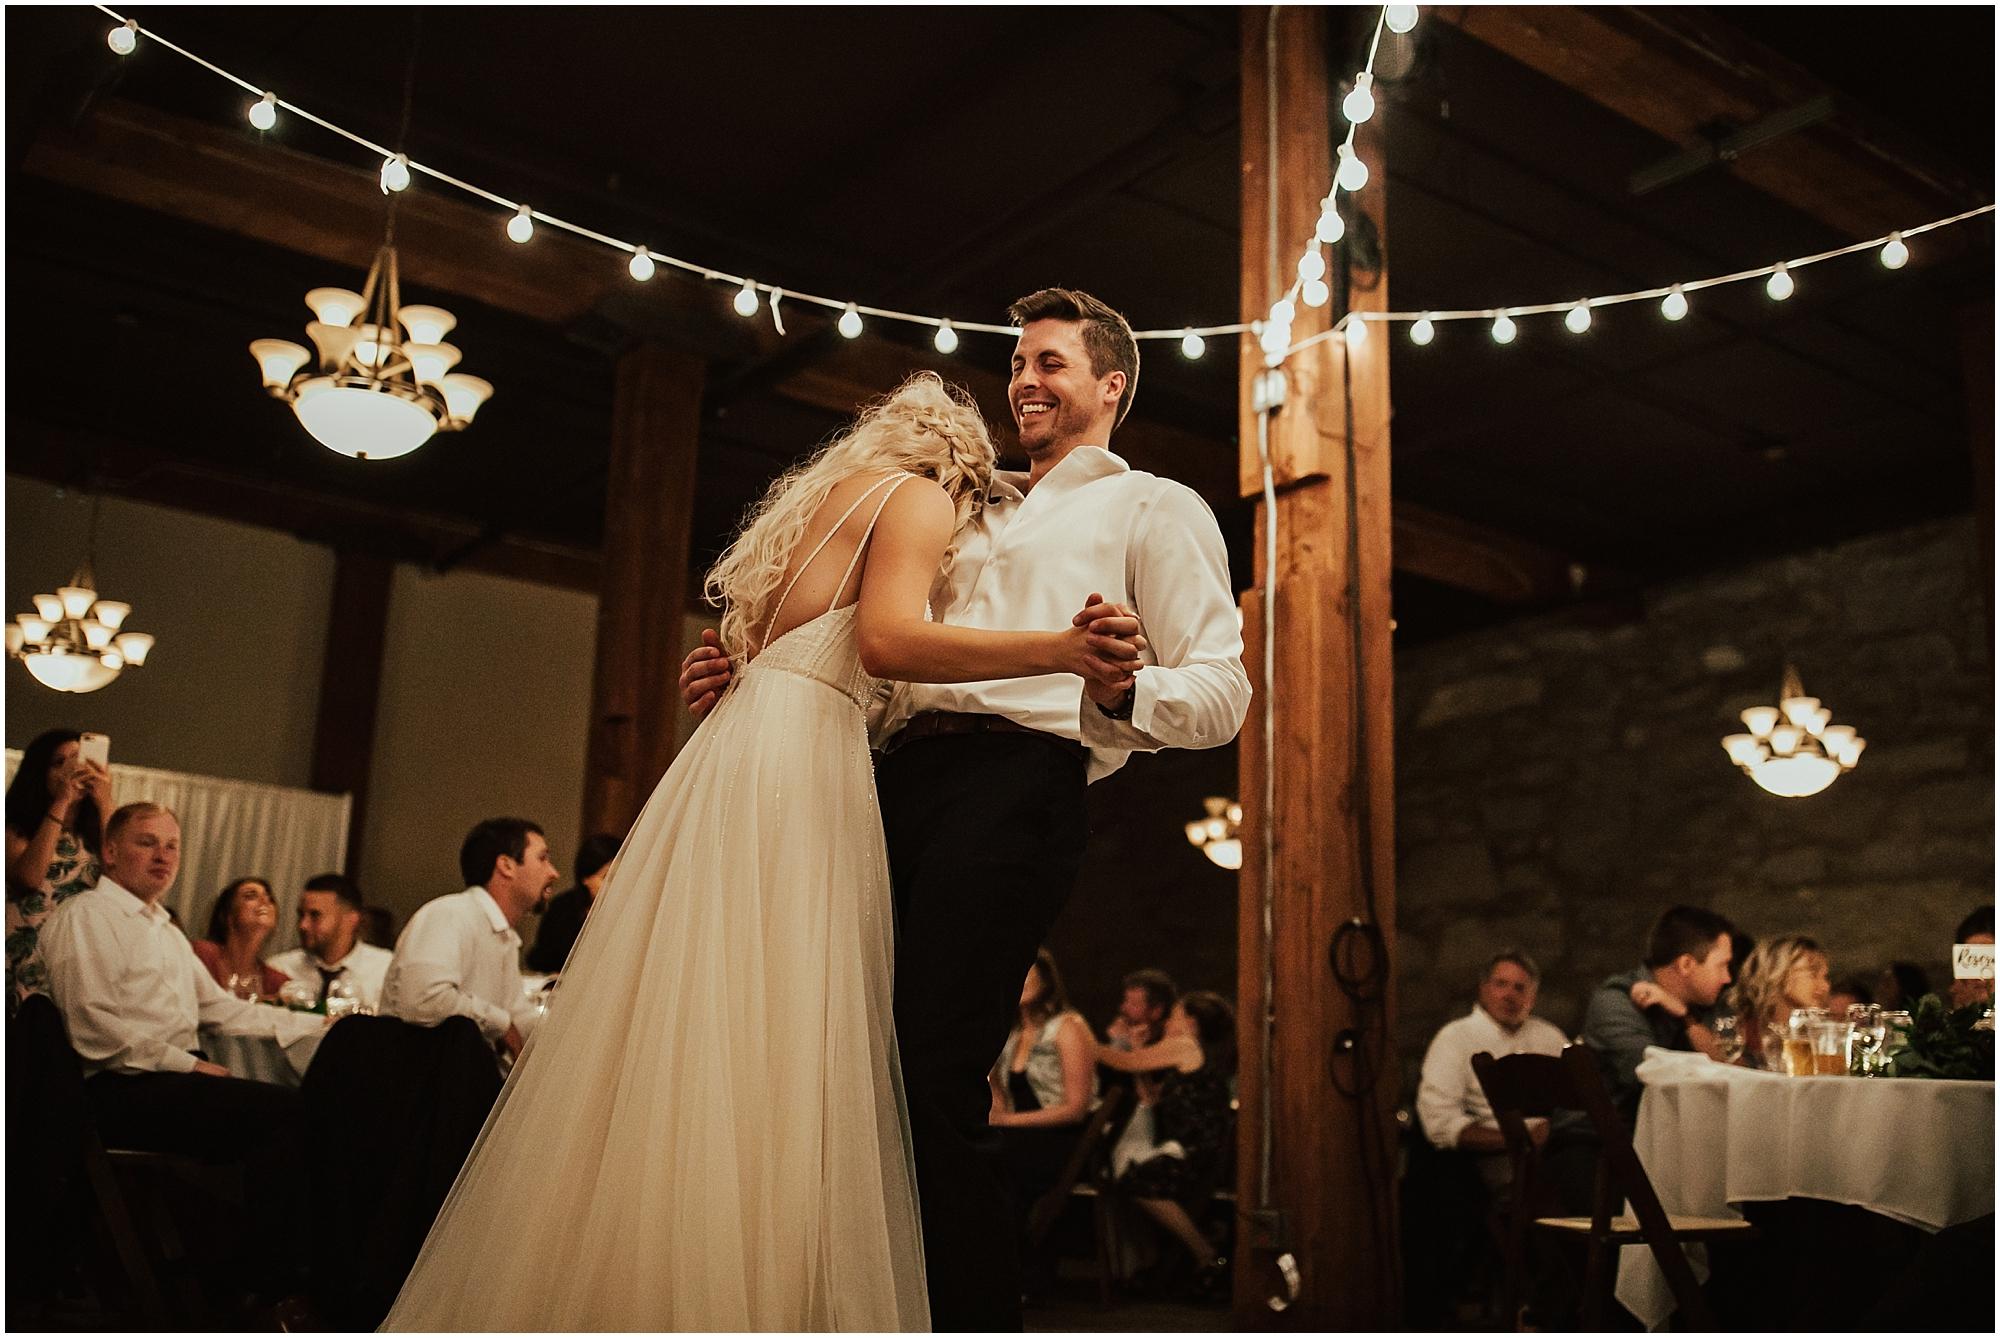 Chateau Rive Spokane Wedding Cassie Trottier Photography1148.jpg